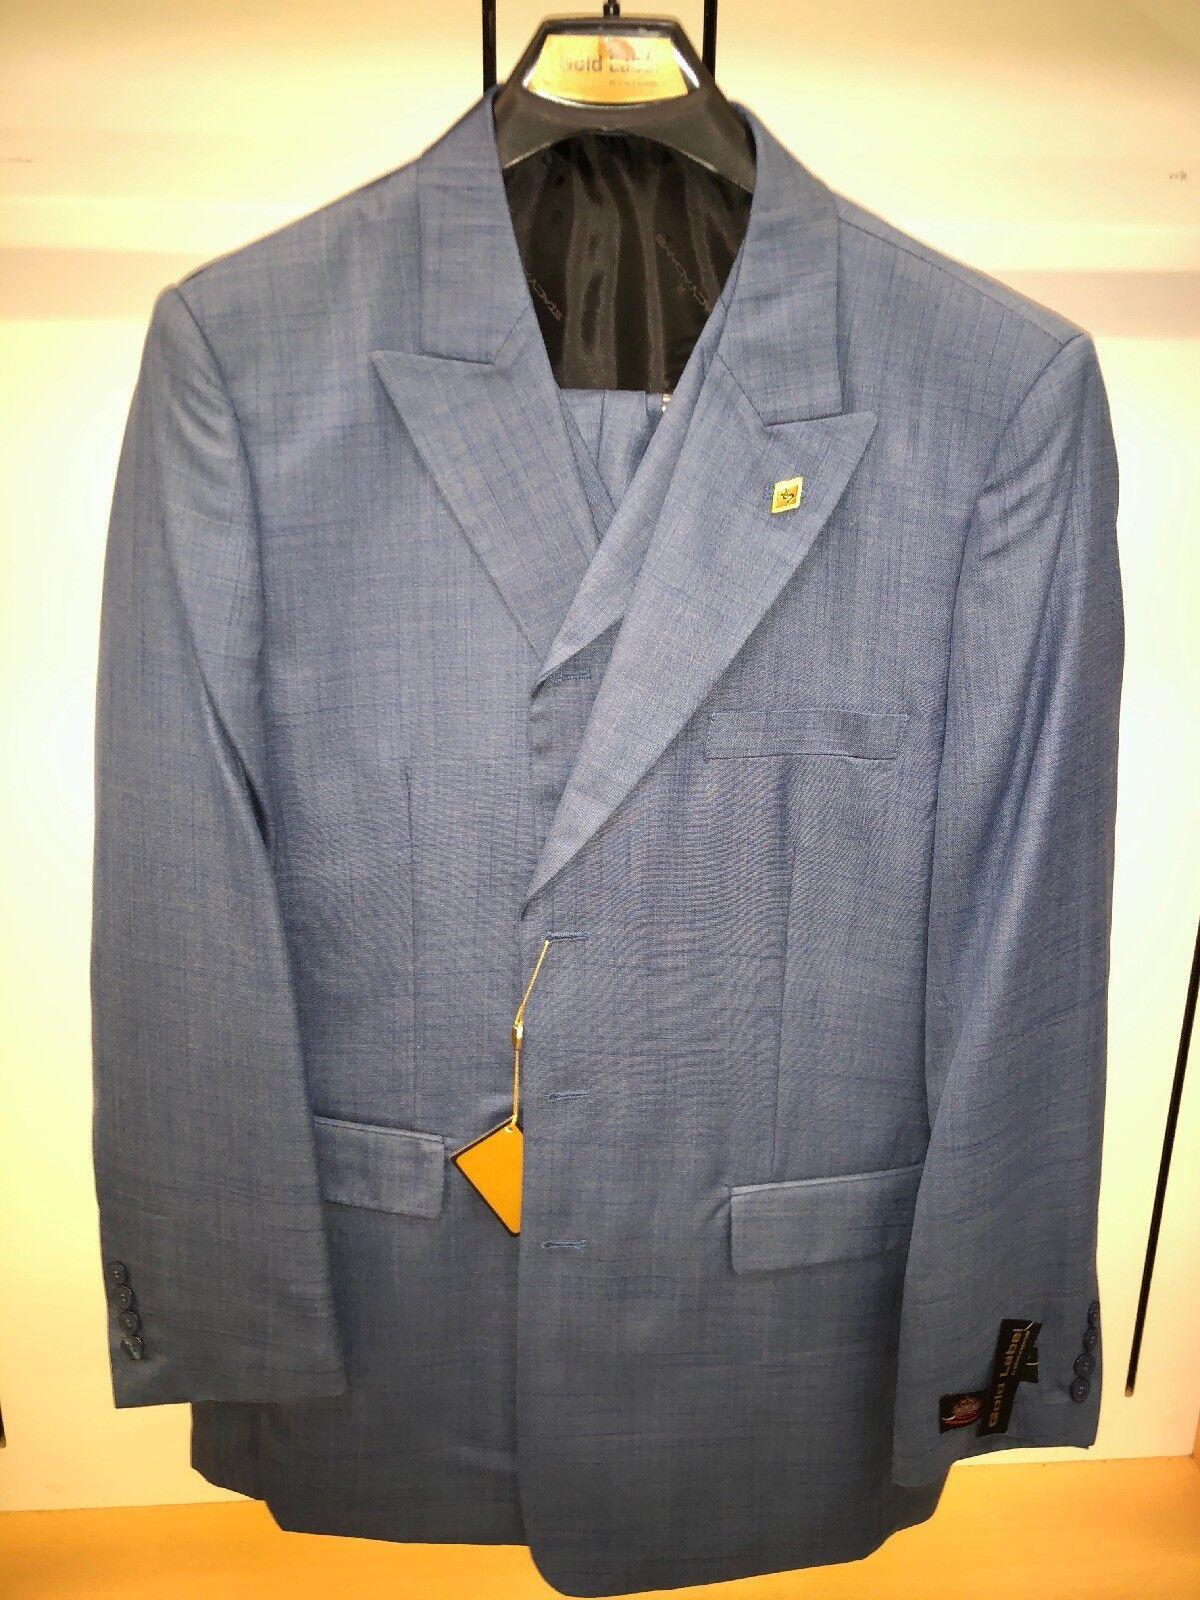 BNWT Stacy ADAMS 44R Mid Blau Fashion Solid  Harvey Exotic Classy Suit 3PC Steve